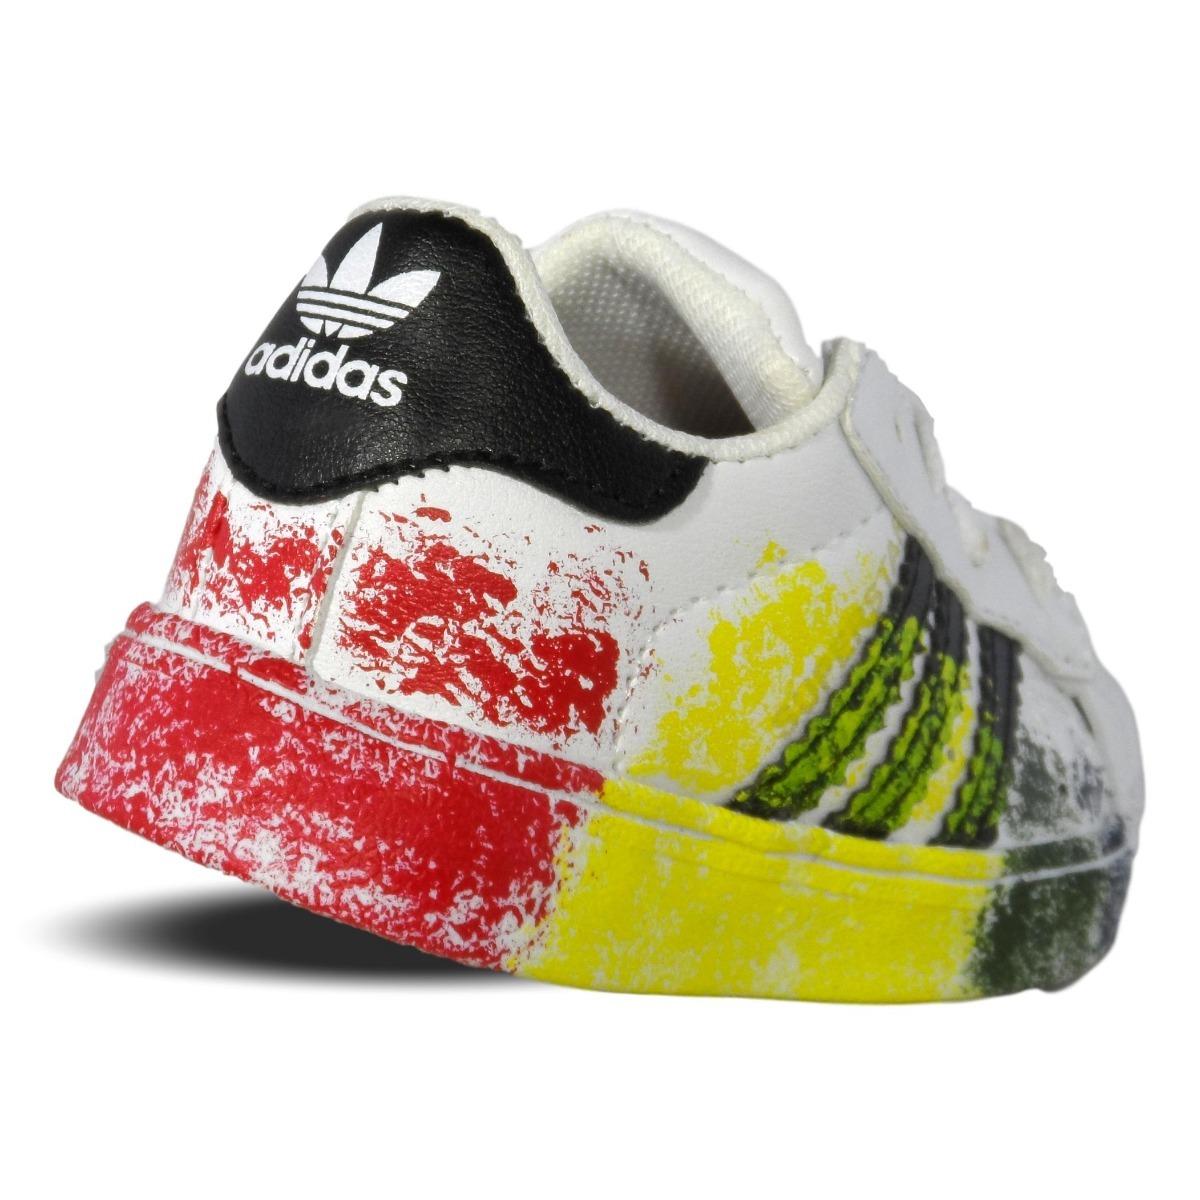 new style d8845 dd7b1 tenis adidas superstar pride pack blanco camuflaje bebe. Cargando zoom.